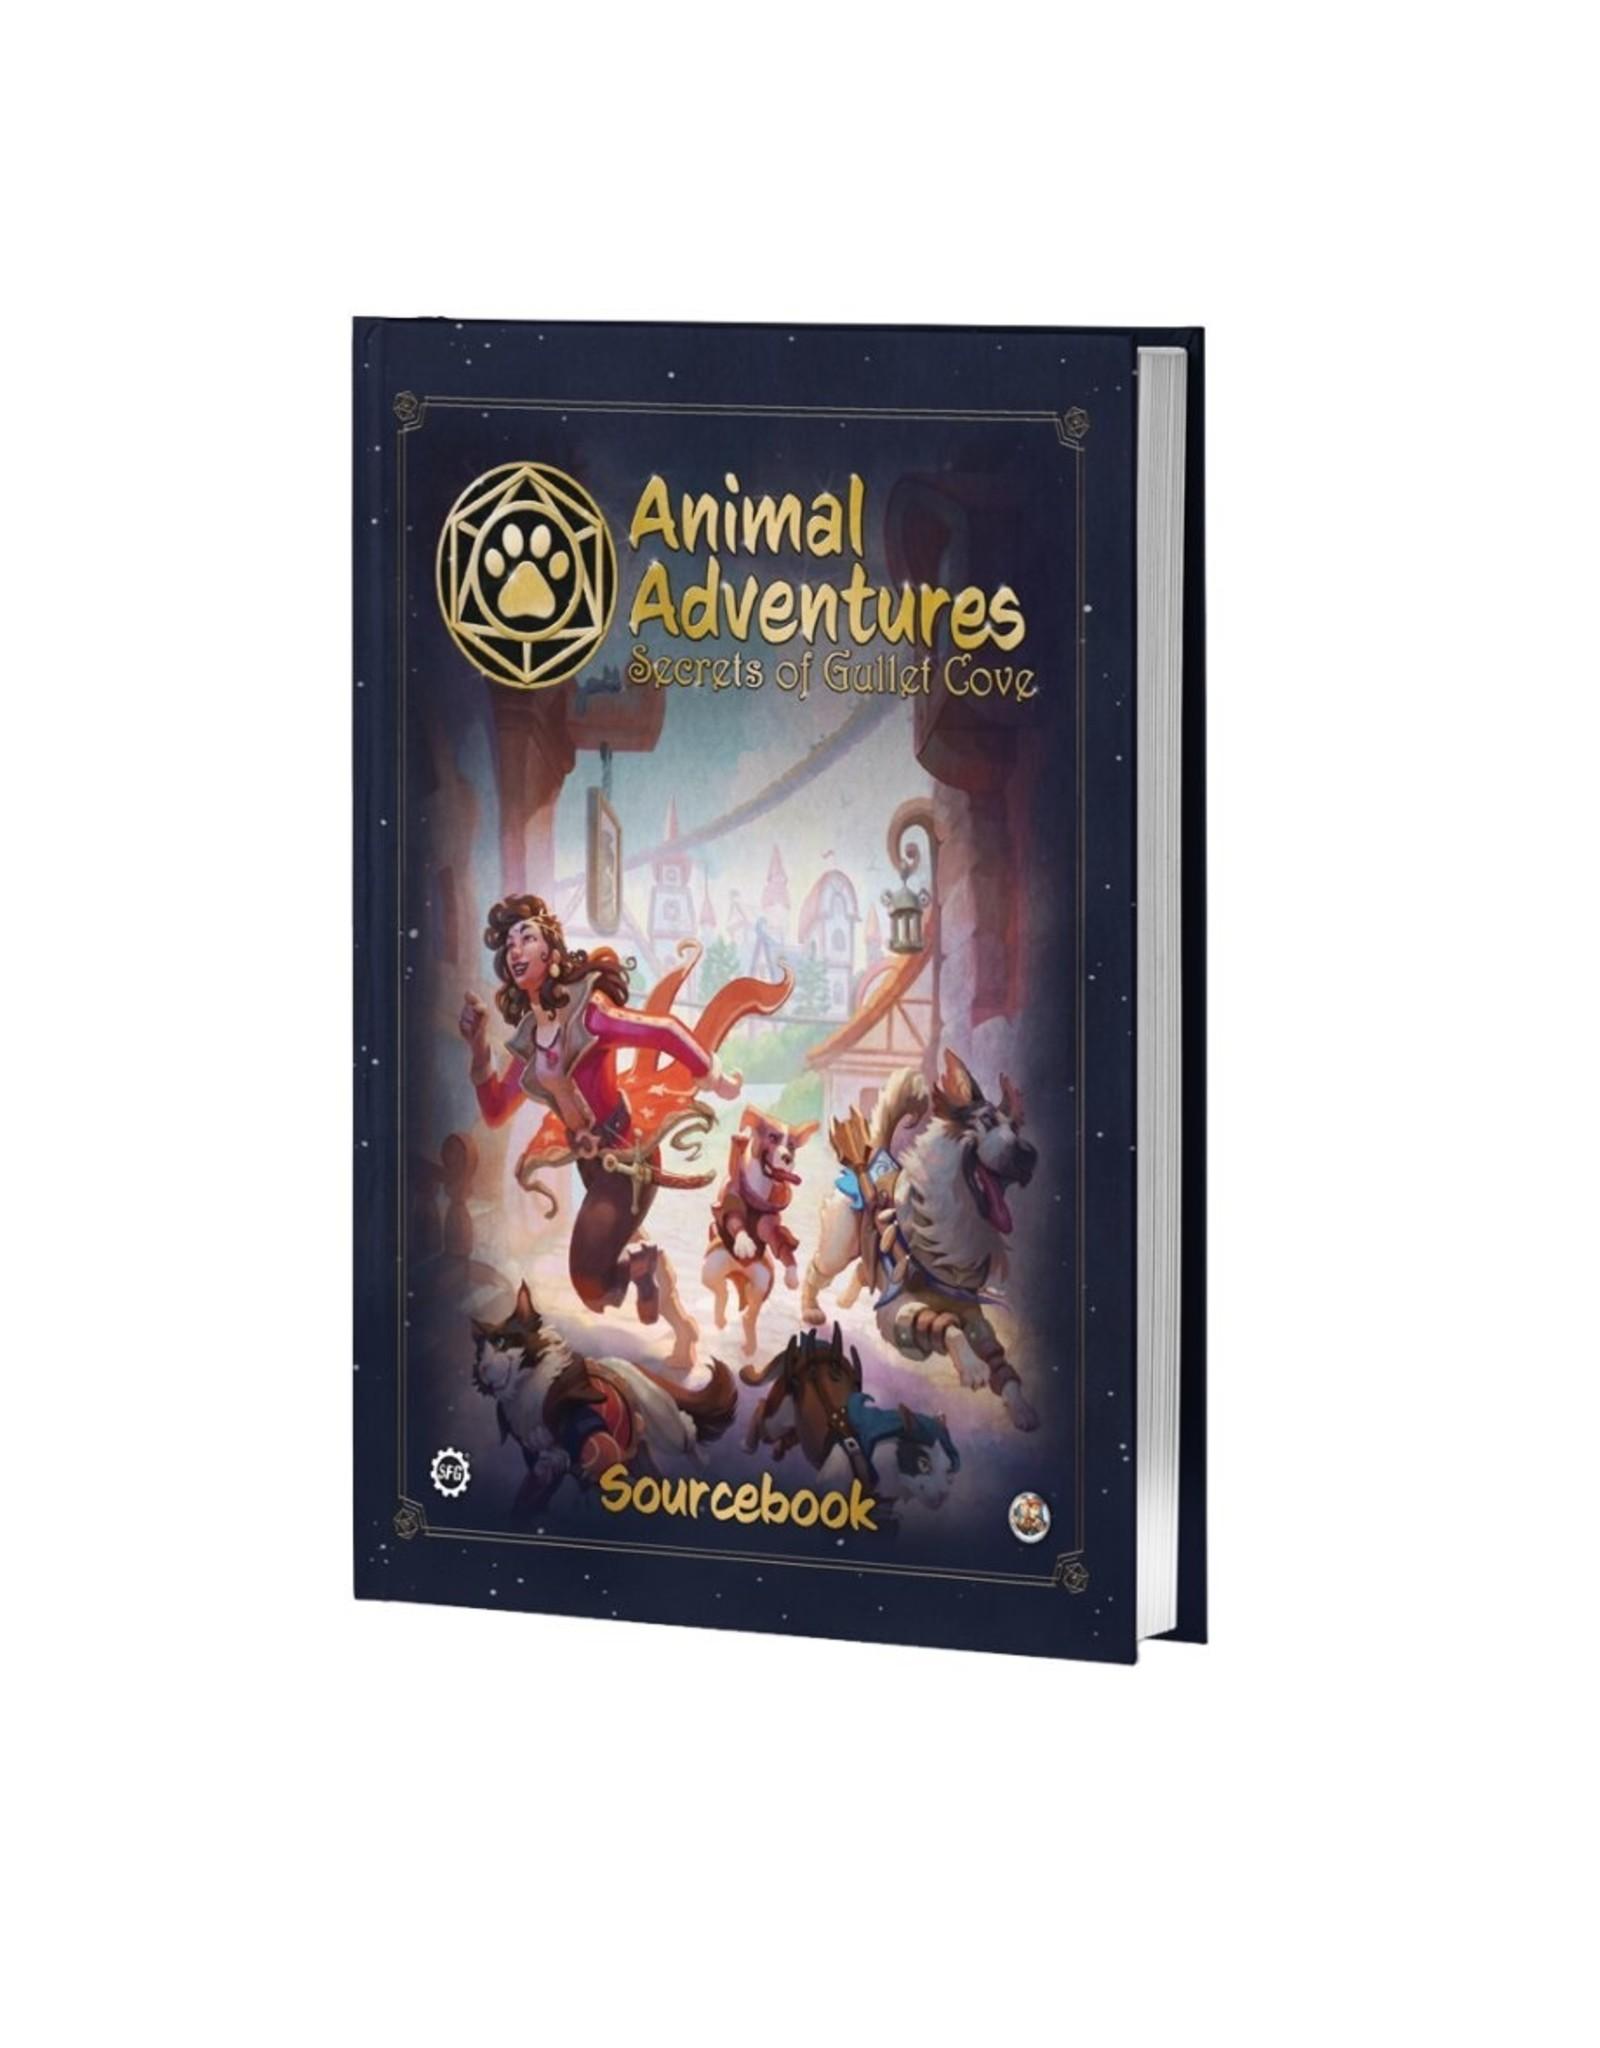 Steamforged Games LTD Animal Adventures: Secrets of Gullet Cove Sourcebook